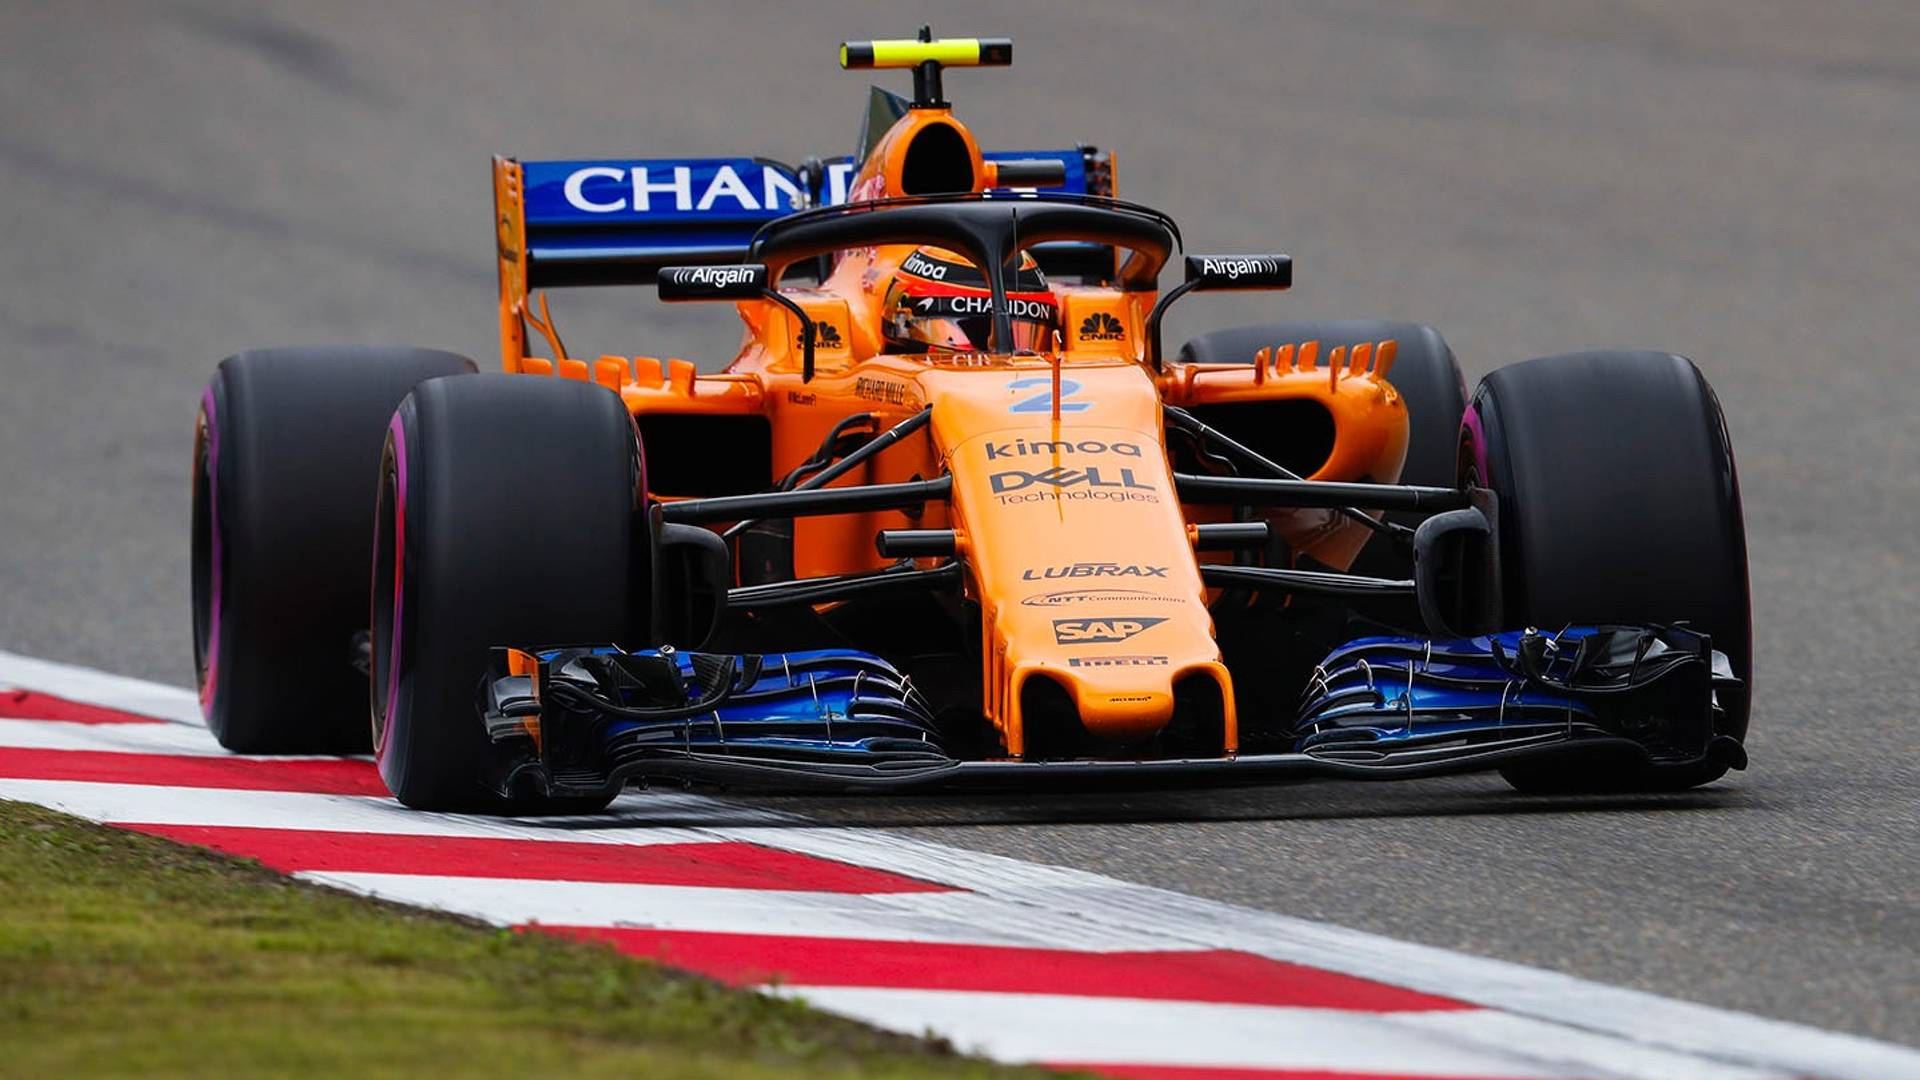 52da2cc8273dc McLaren s Halo gets cheeky flip-flop sponsorship for good cause